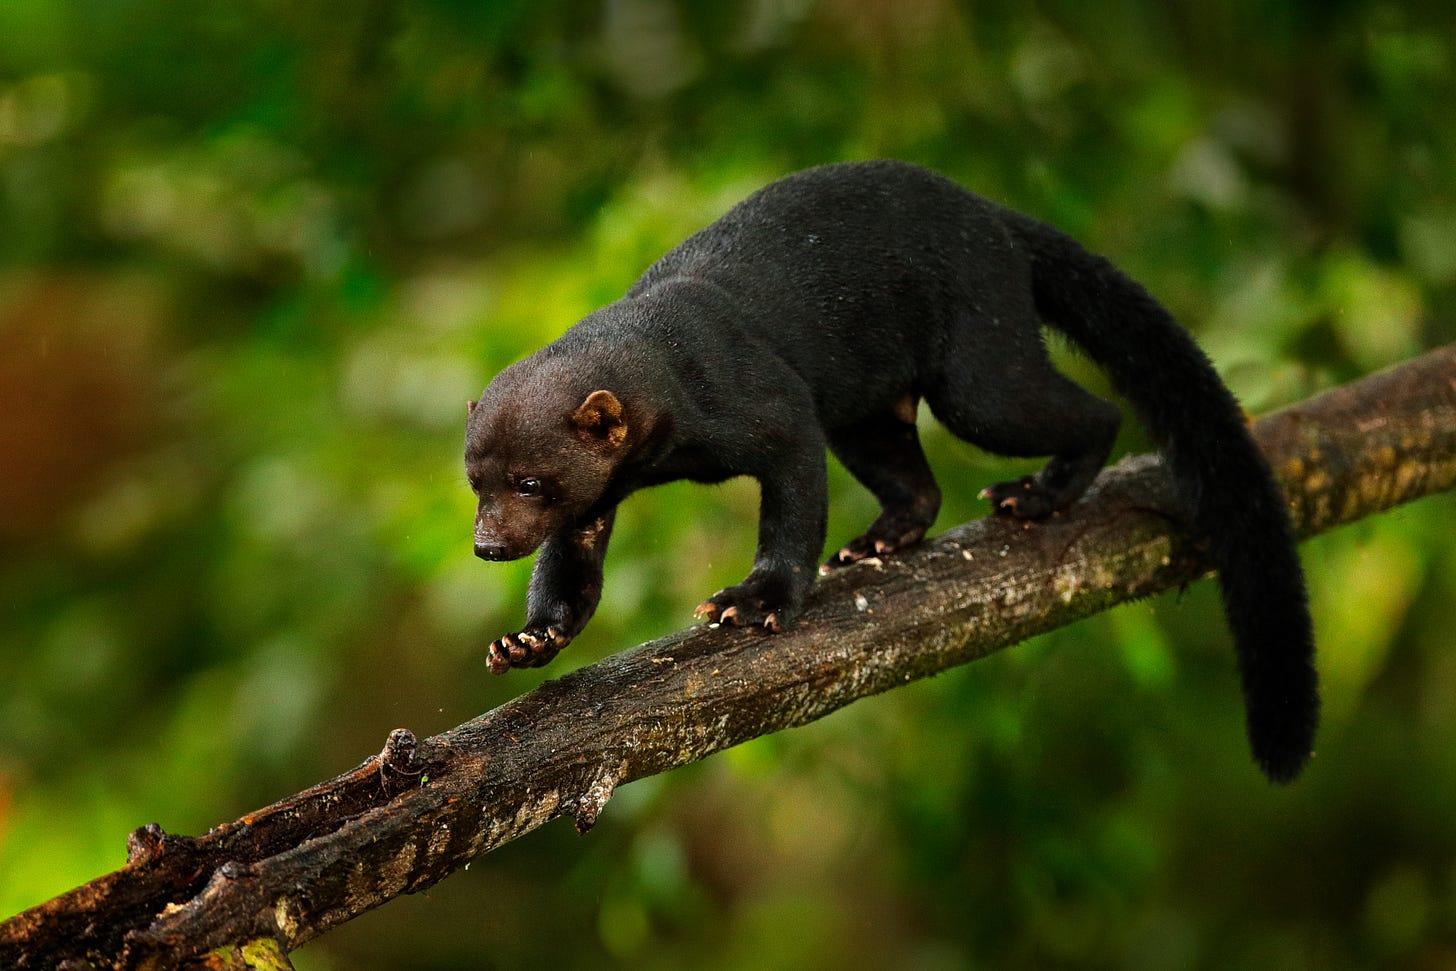 Tayra in Costa Rica, photo by Ondrej Prosicky